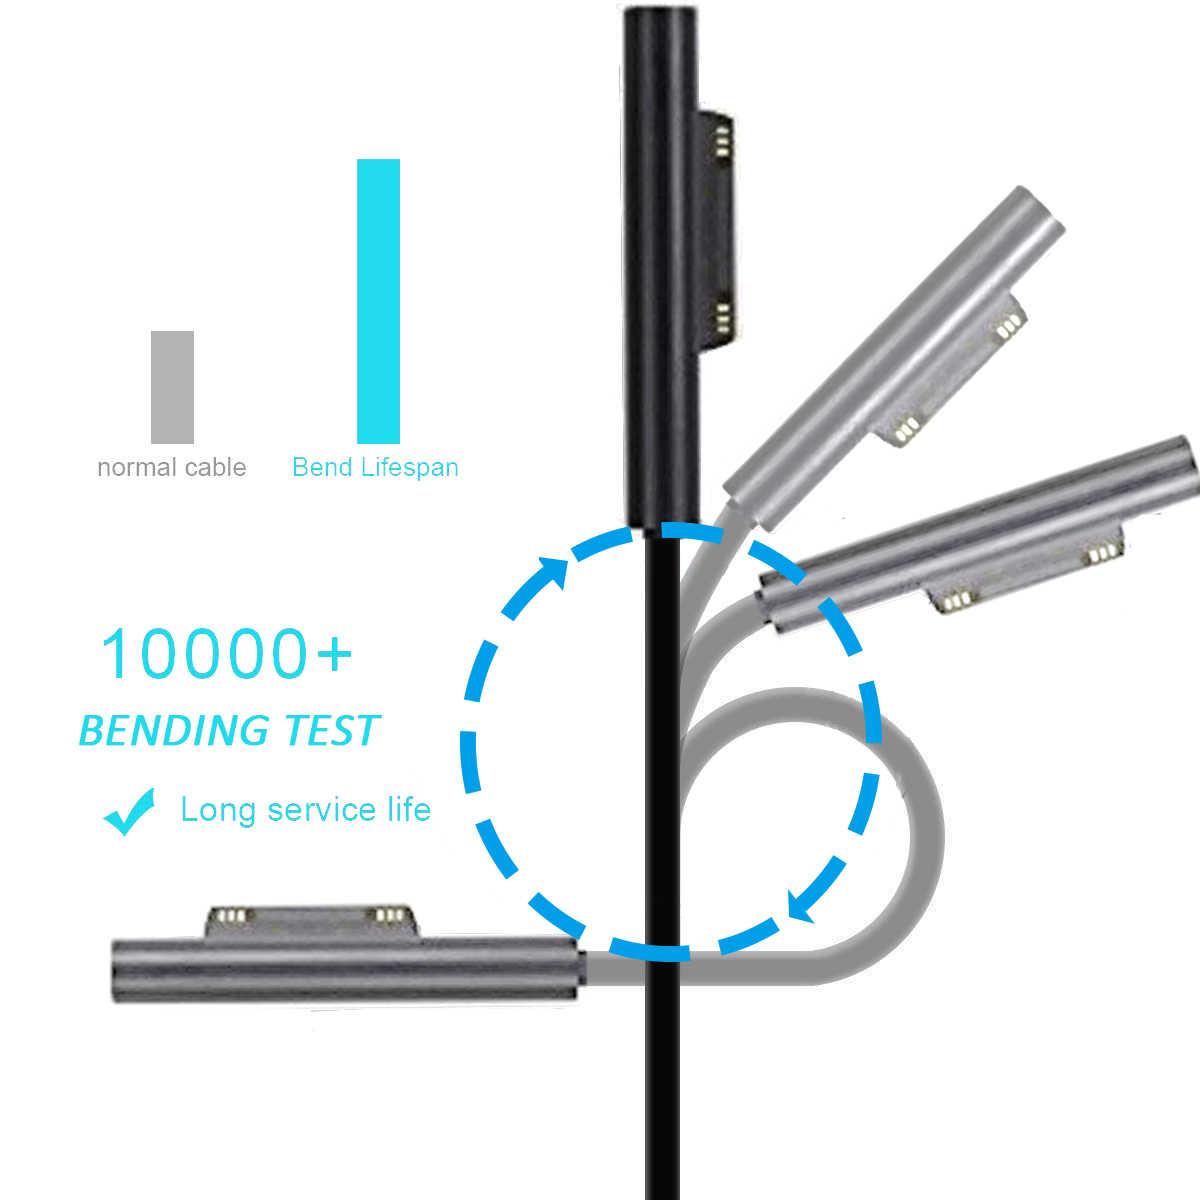 Reino Unido enchufe 65W 15V 4A adaptador de cargador de CA 1706 reemplazo para Microsoft Surface Pro 3 Pro 4 Cable de fuente de alimentación Pro4 Pro3 Tablet P